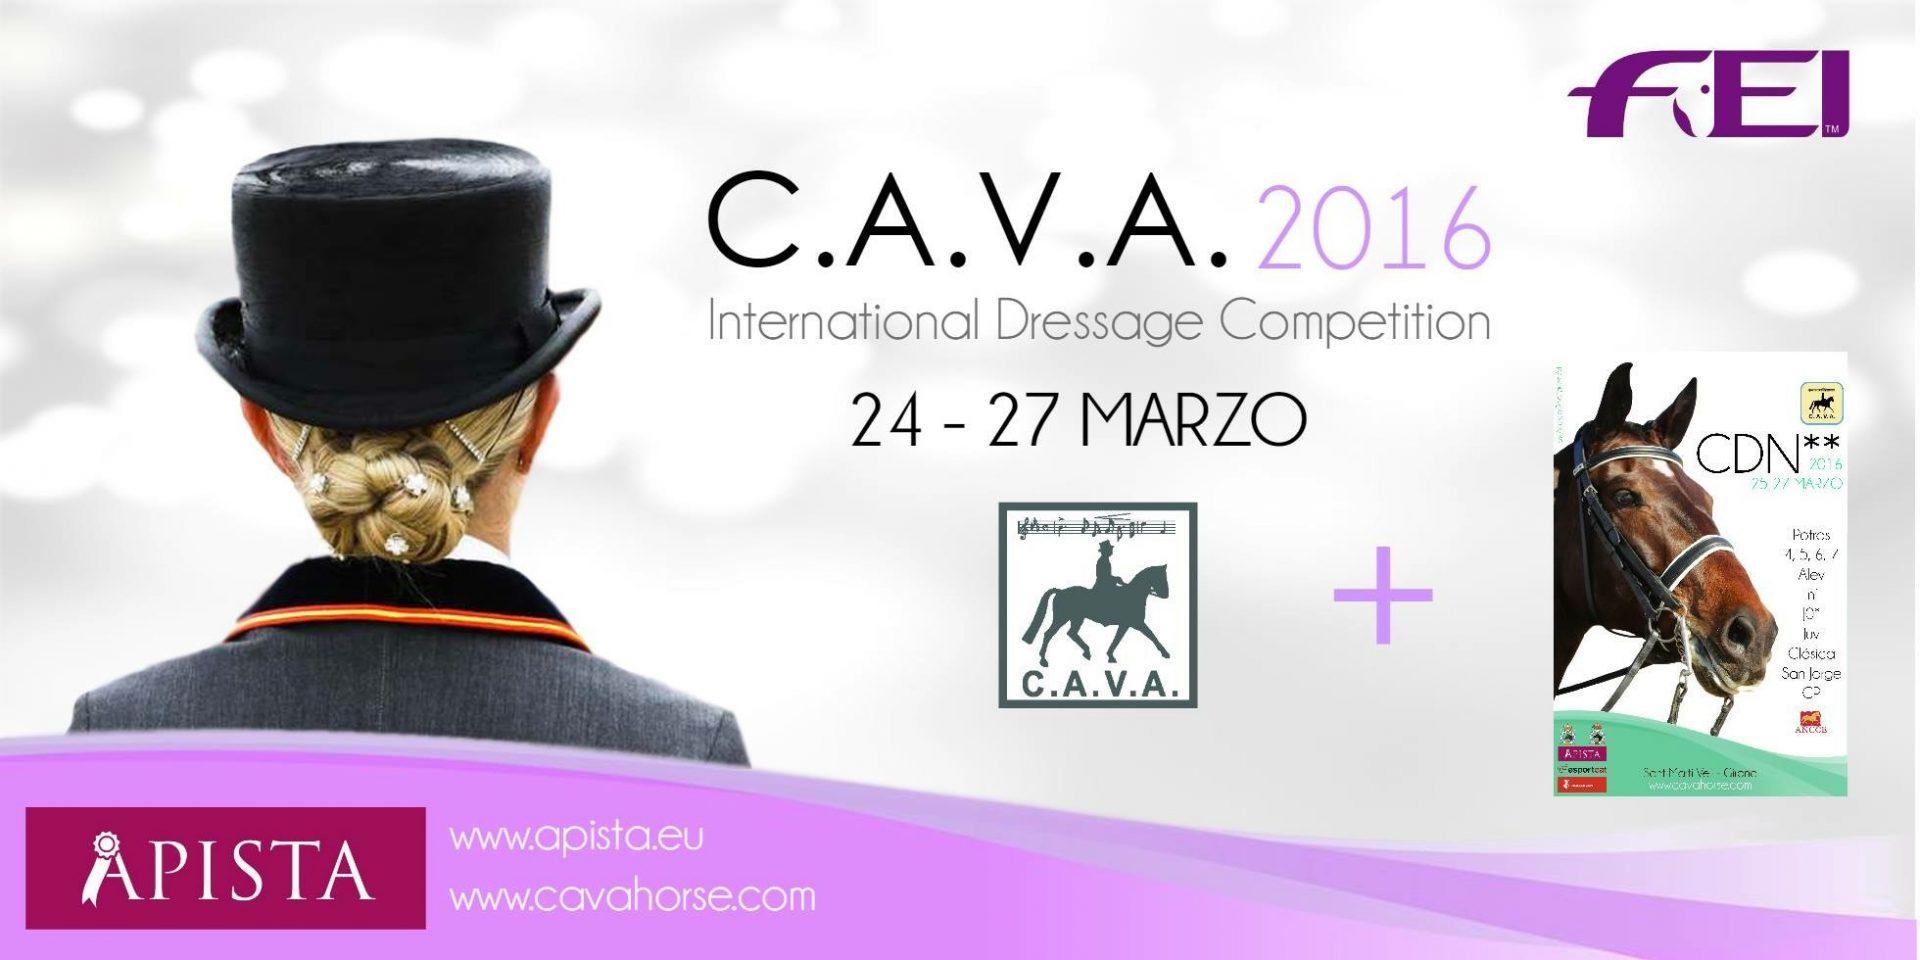 CAVA 2016